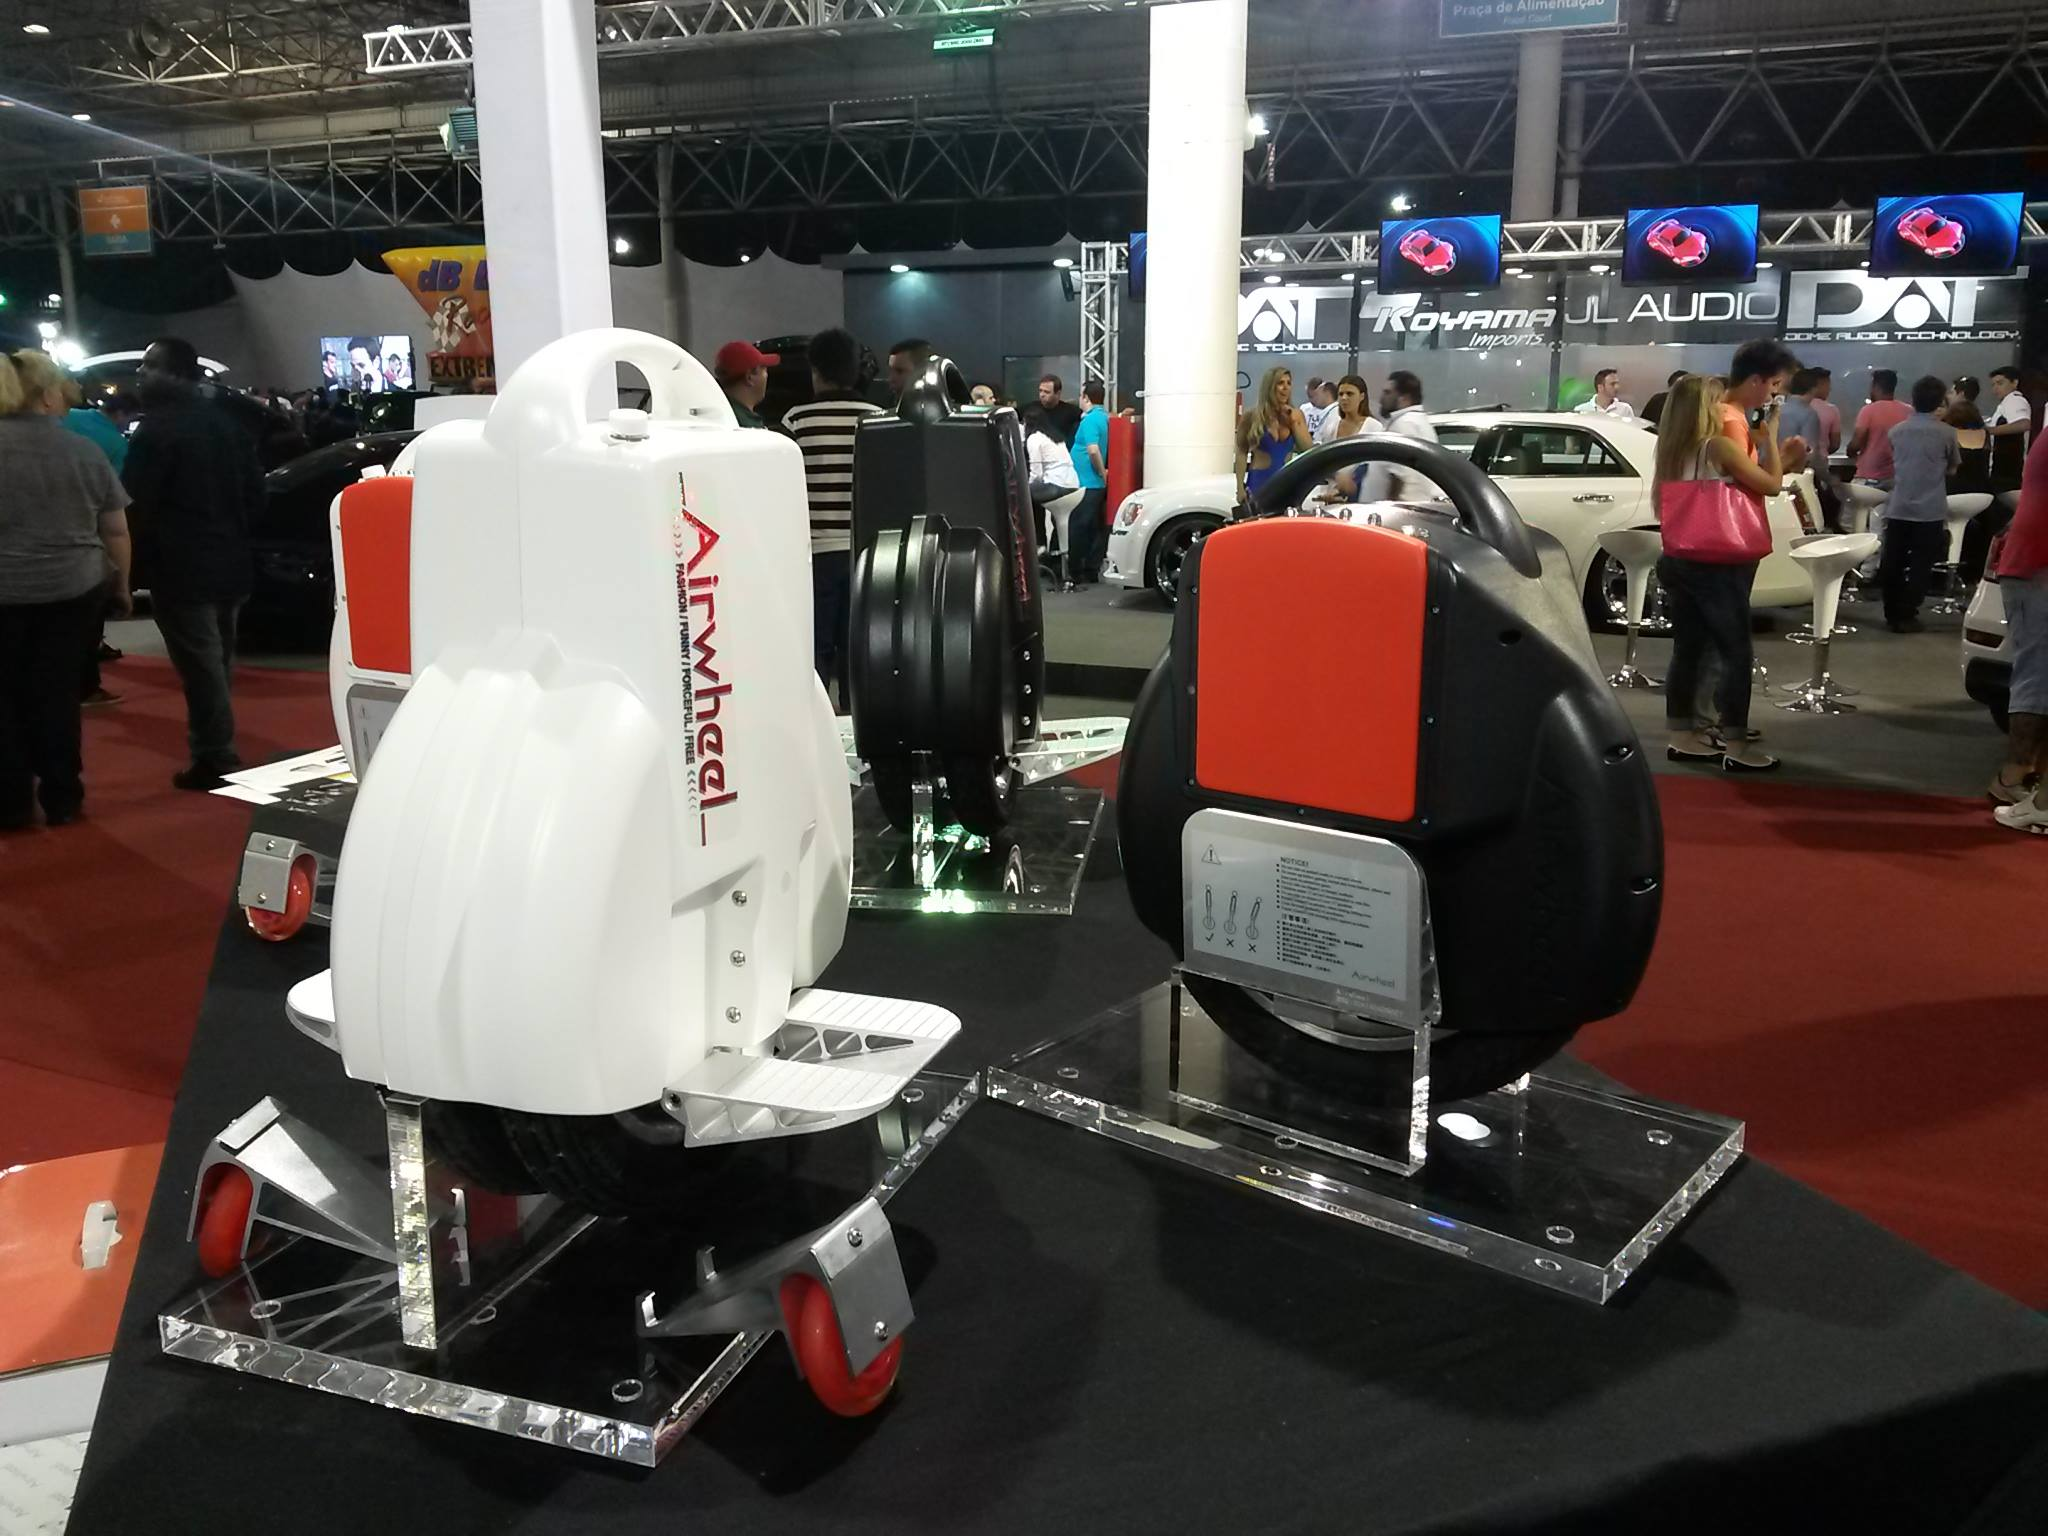 monociclo eléctrica, Airwheel